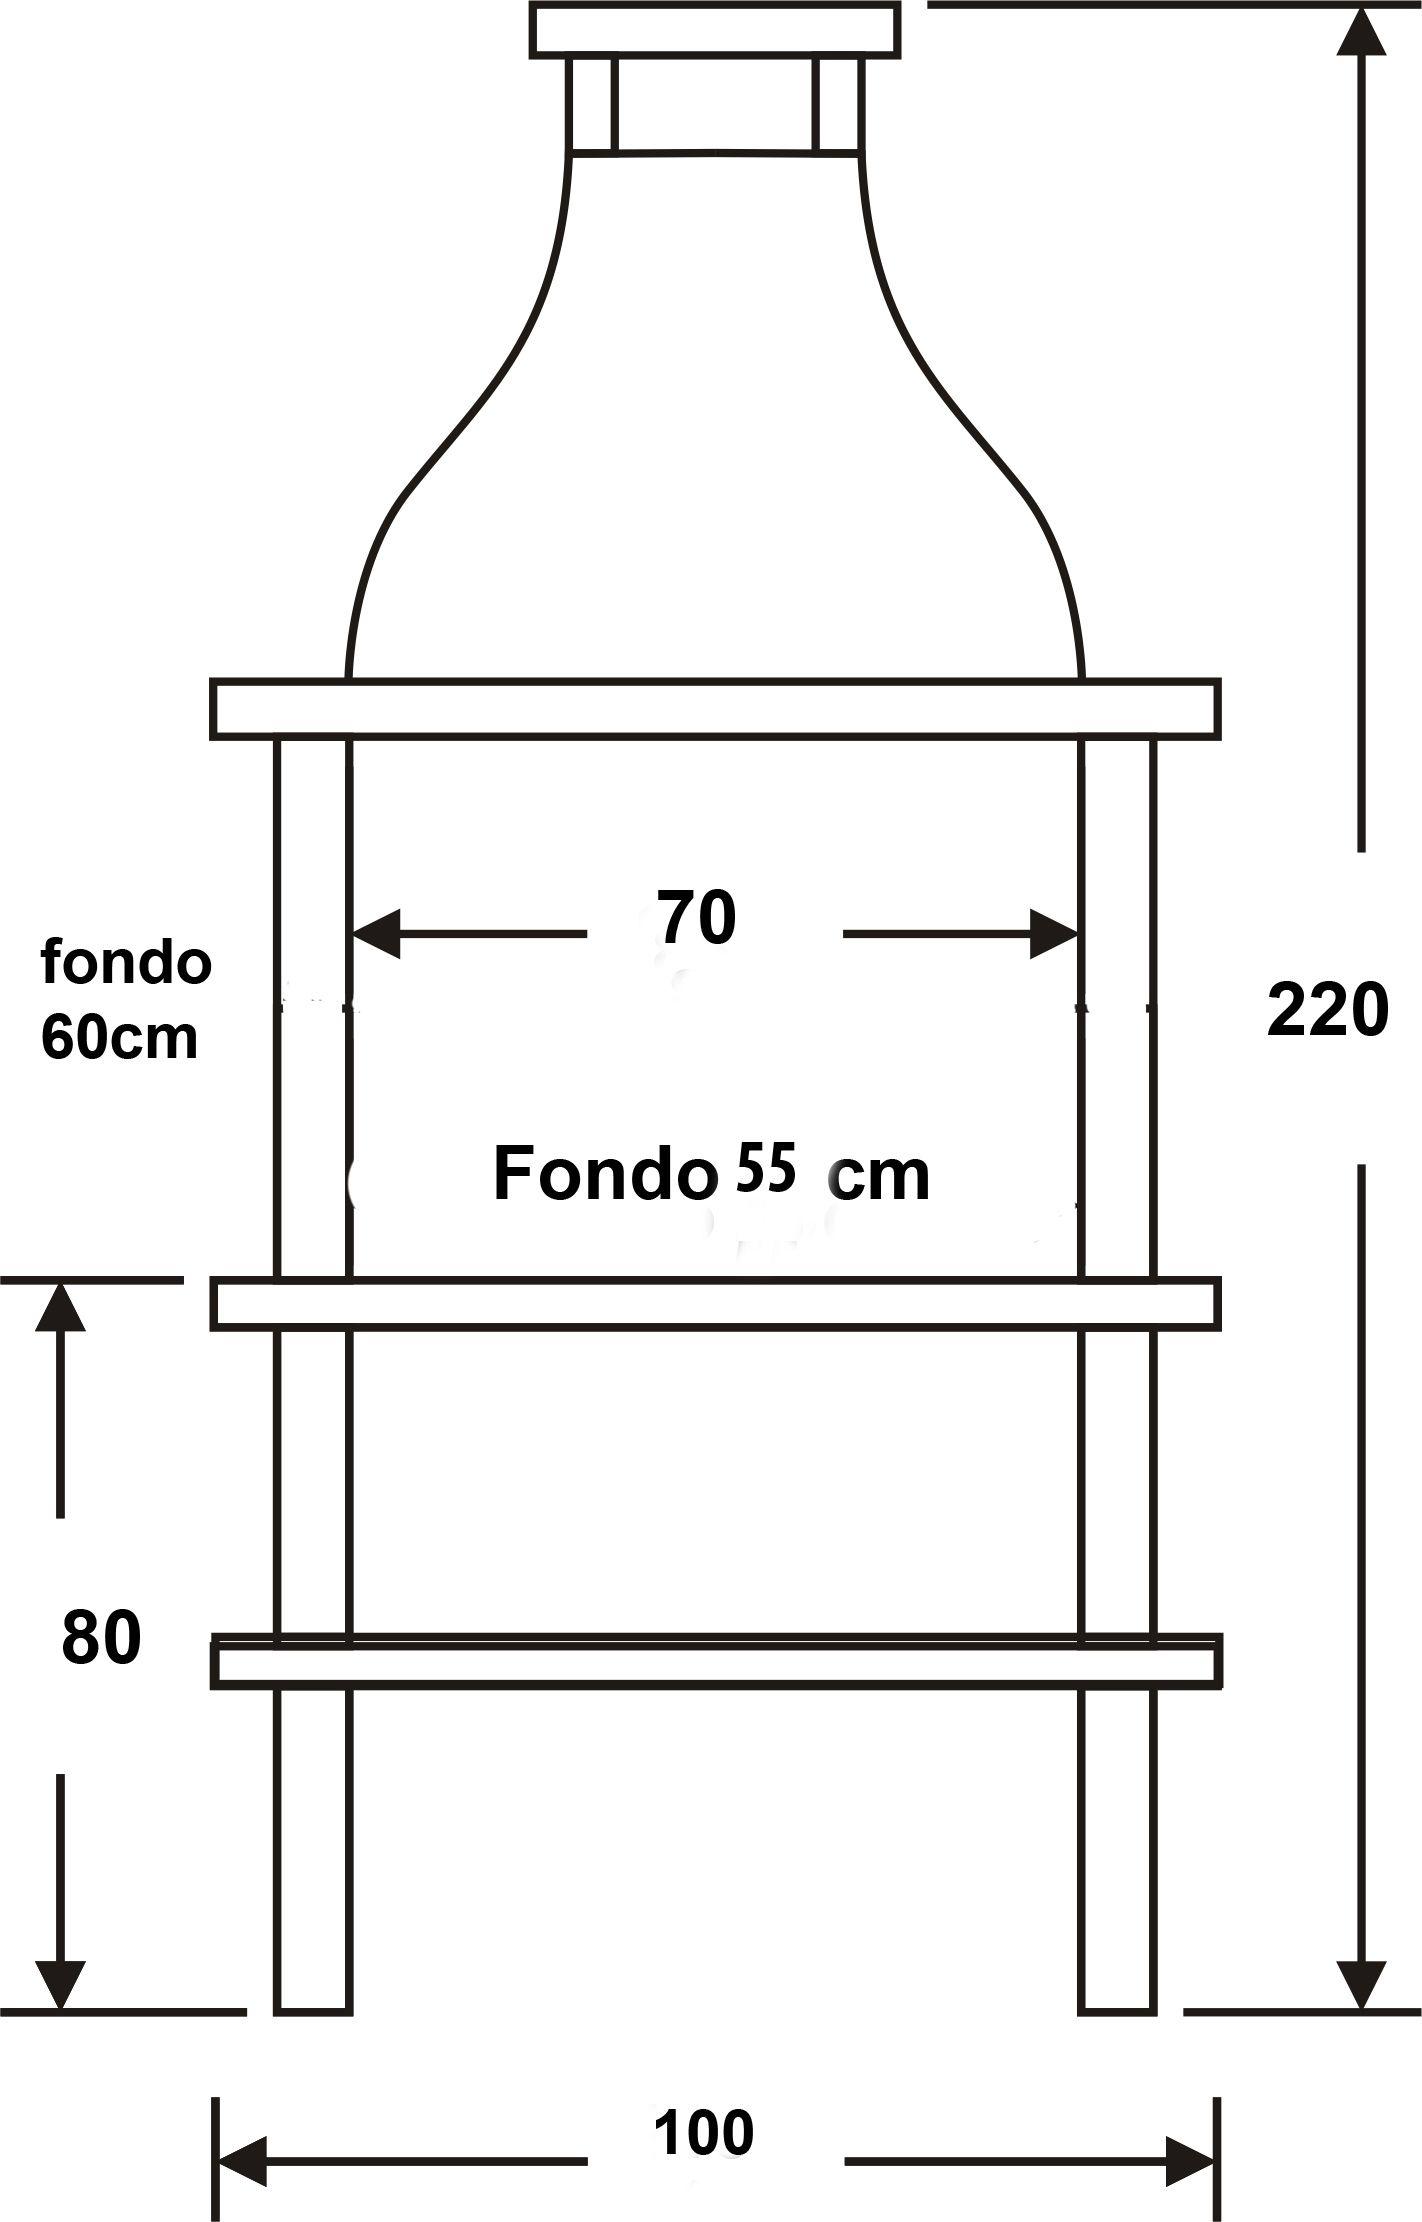 Medidas barbacoa elegant 41001 ogrod barbecue design - Como construir una barbacoa de obra ...